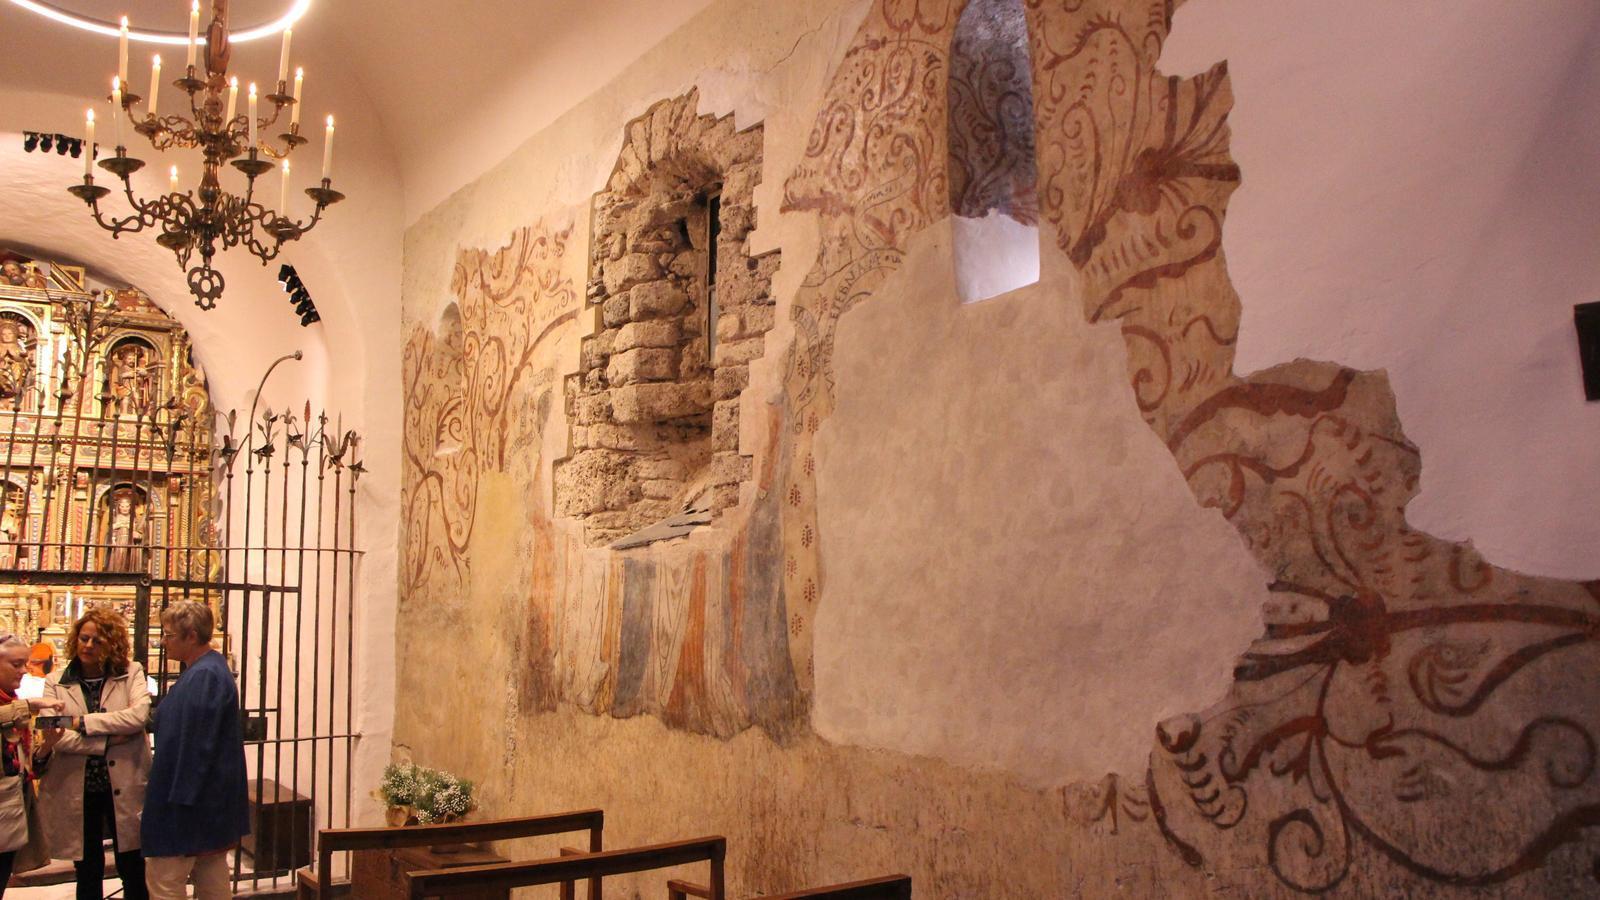 Pintures restaurades a l'església de Sant Climent de Pal. / C. A.